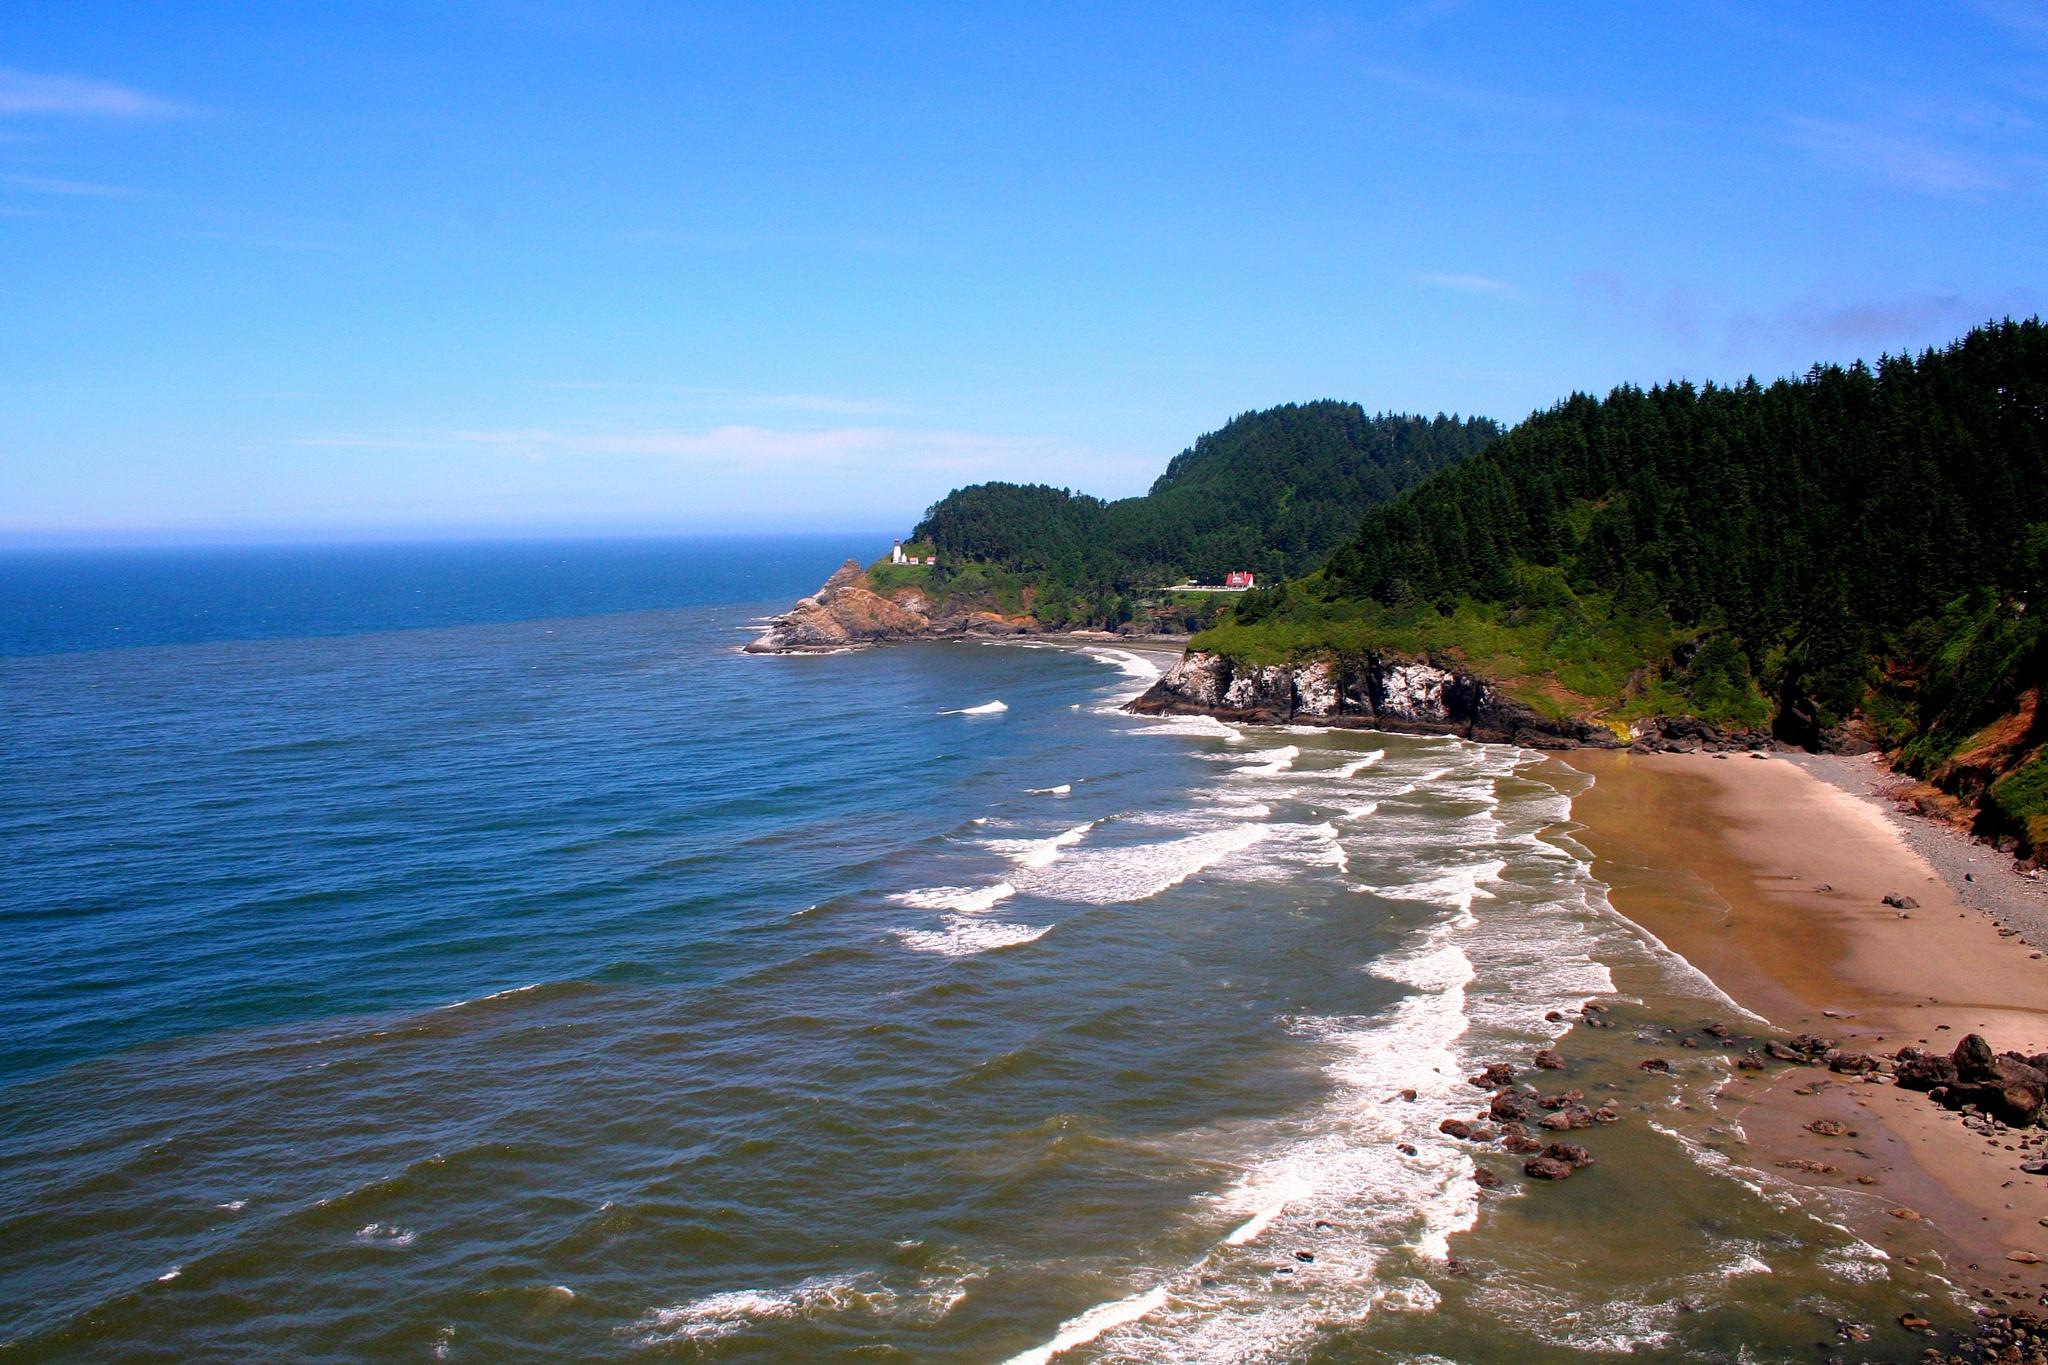 Heceta Head Lighthouse, Oregon coast by katze